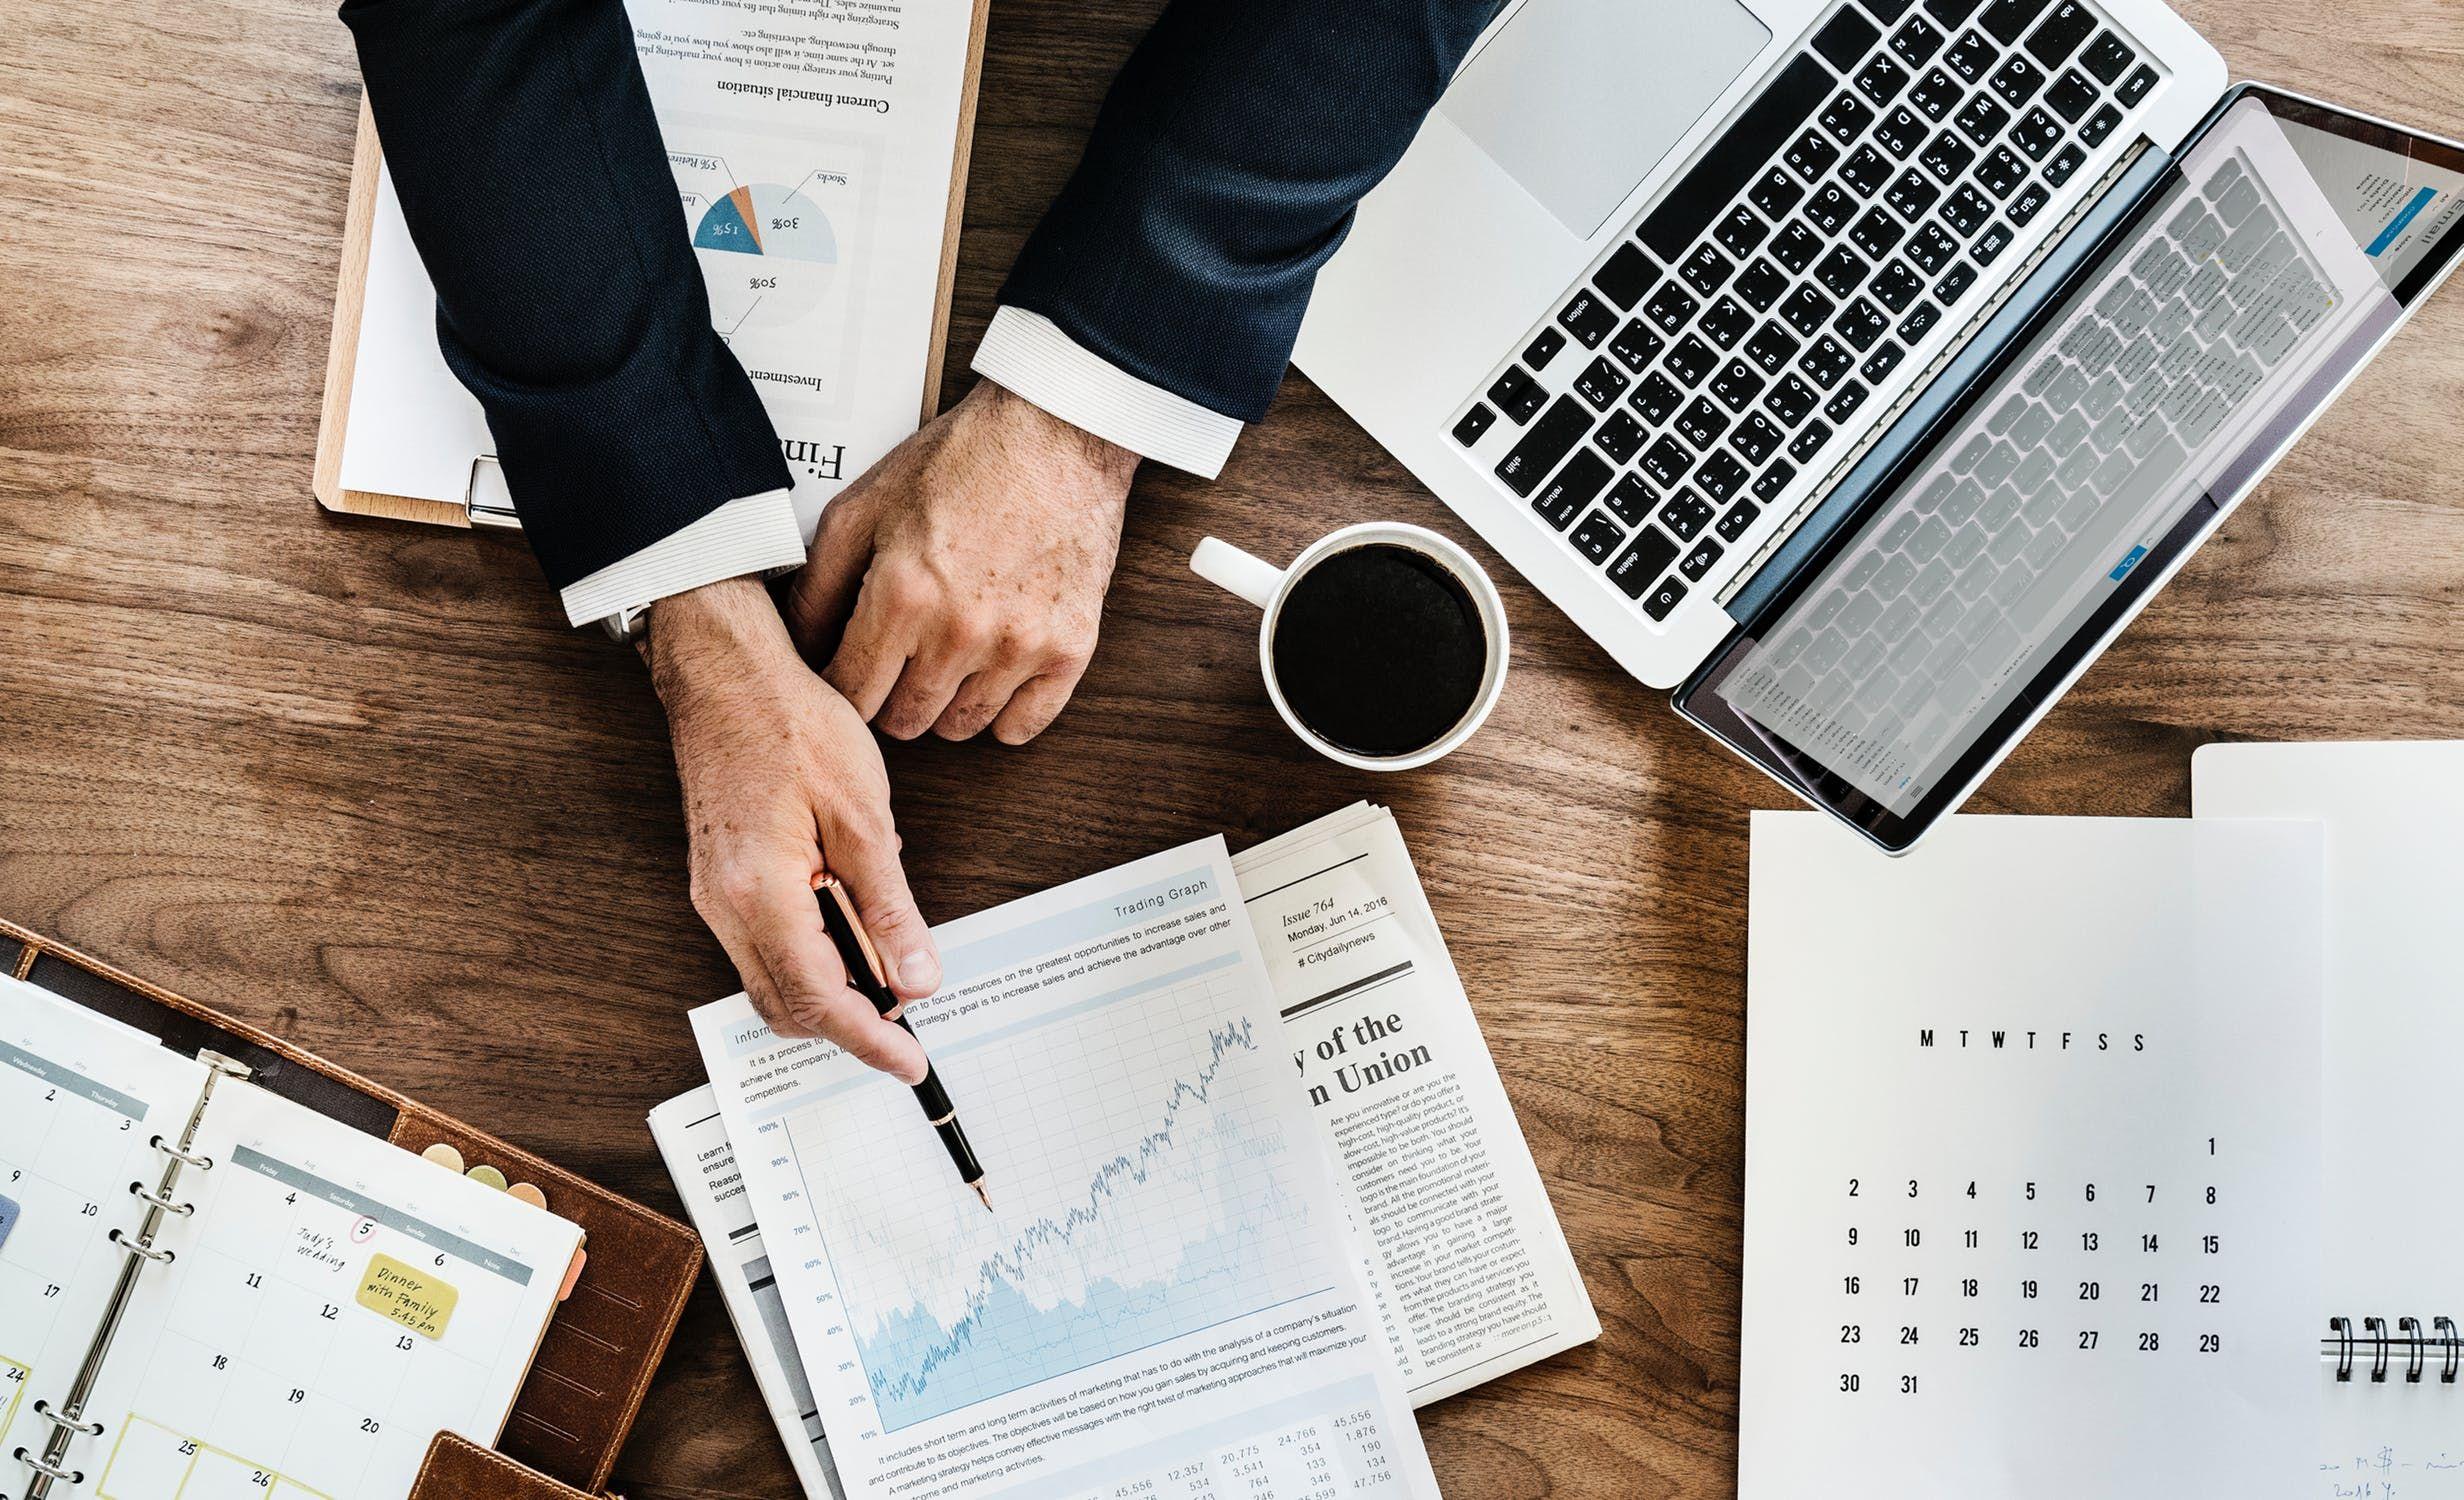 Business Plans Belgravia Solutions Financial Advisors Investing Business Data